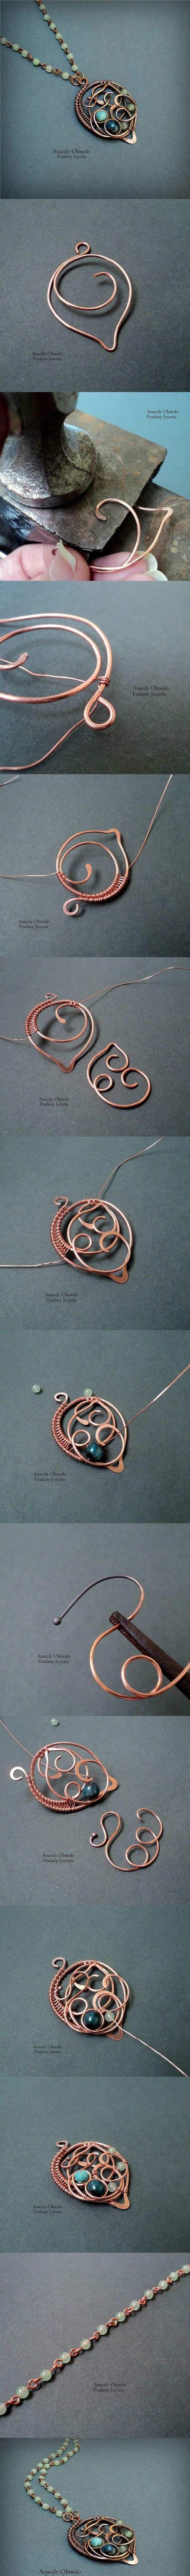 908 best jewelry images on Pinterest   Diy kid jewelry, Jewellery ...